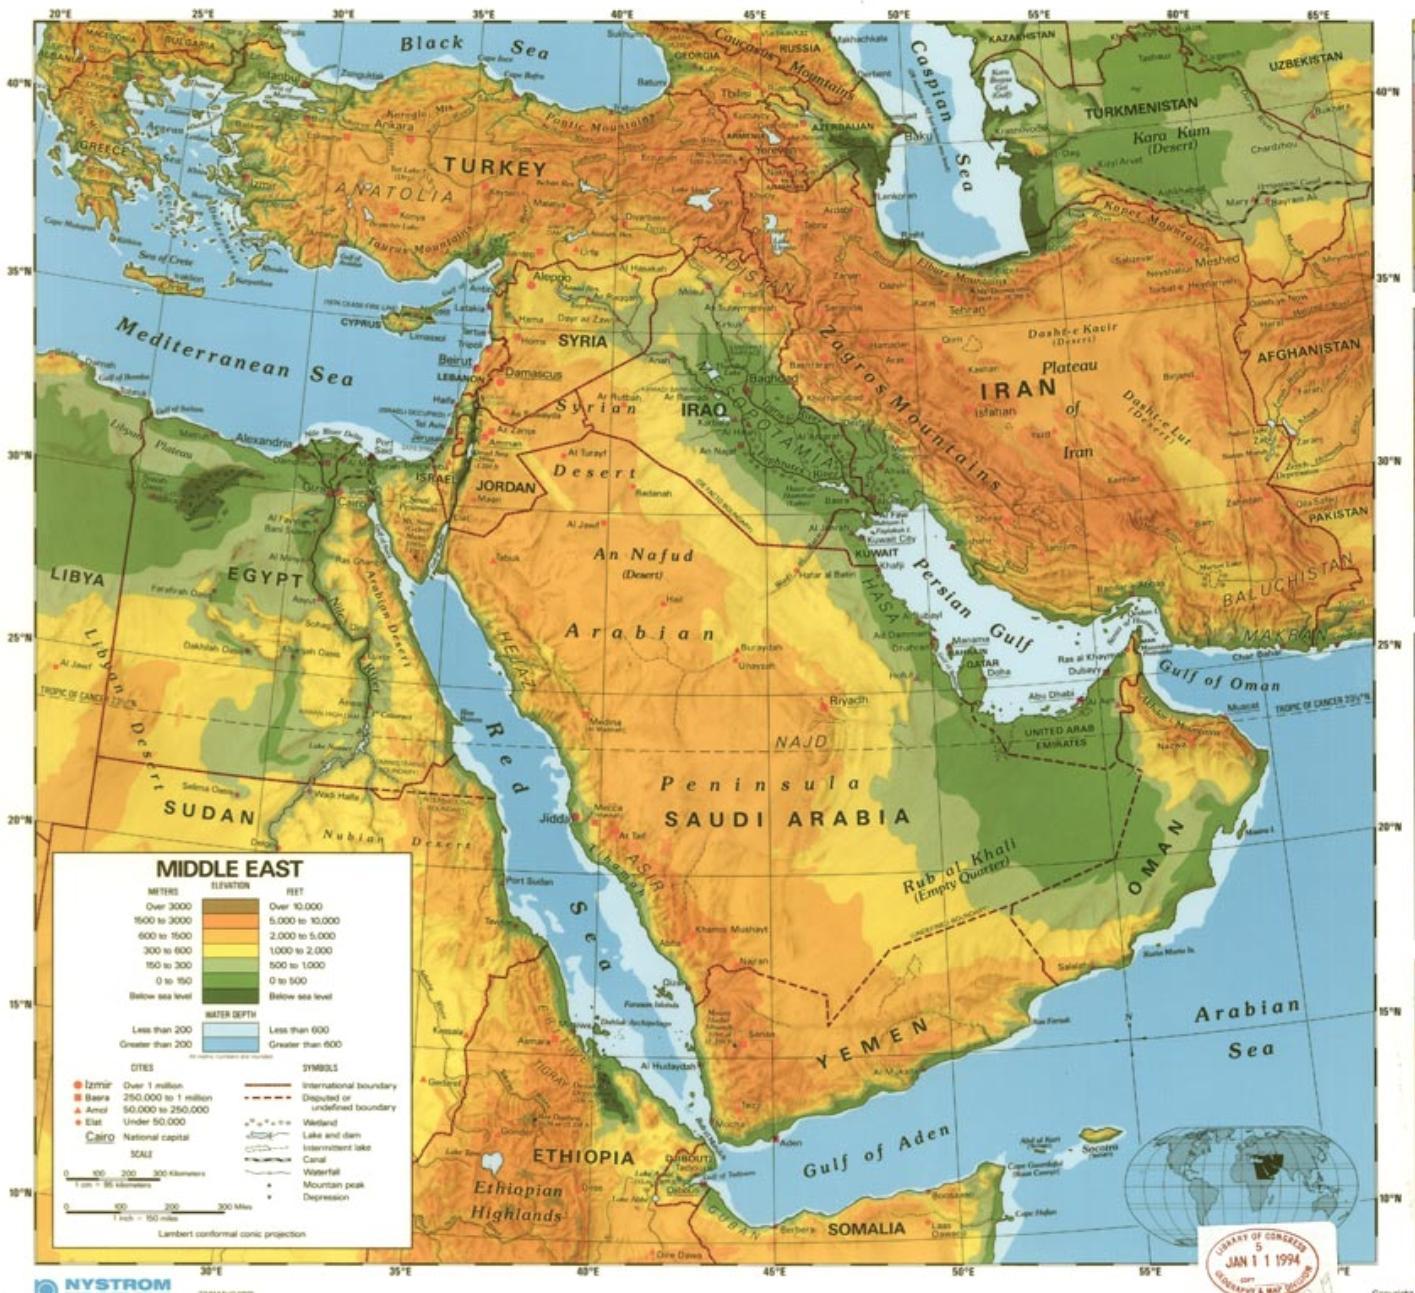 Saudi Arabia Orkenen Kart Kart Over Saudi Arabia Orkenen Vest